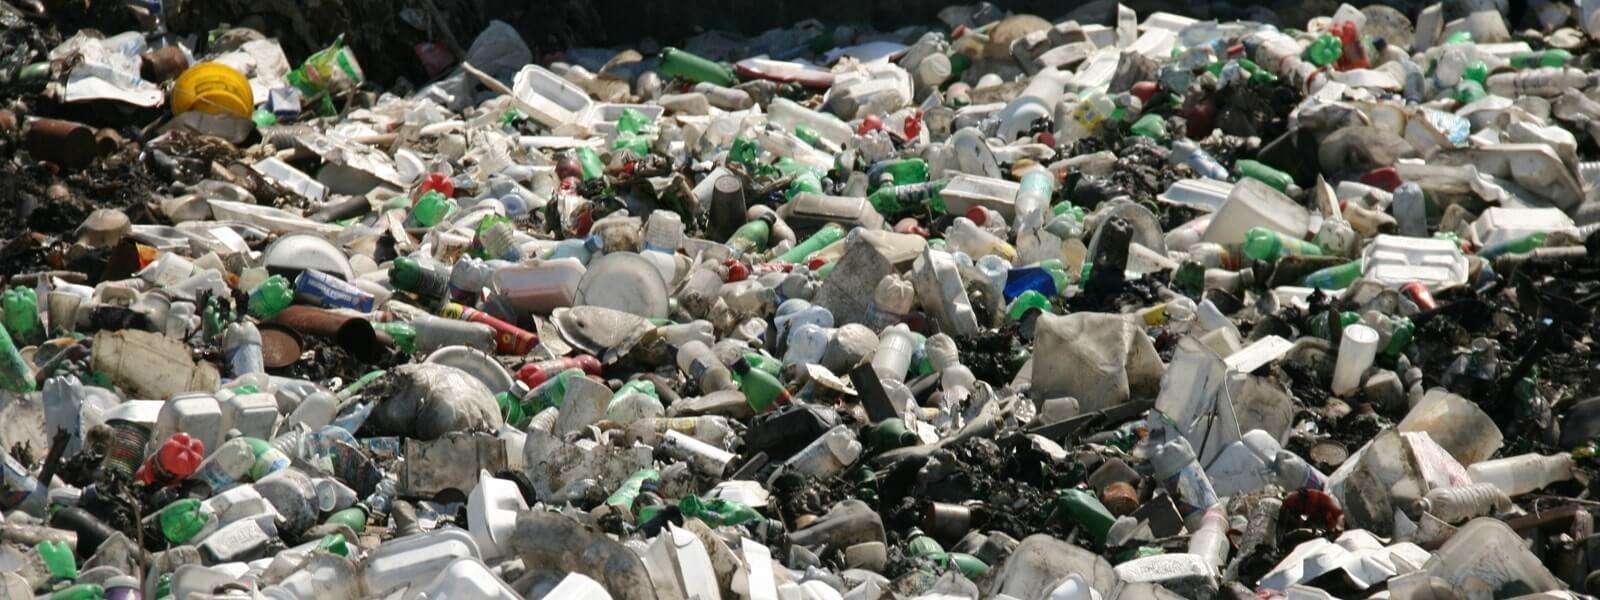 GME Waste Dump